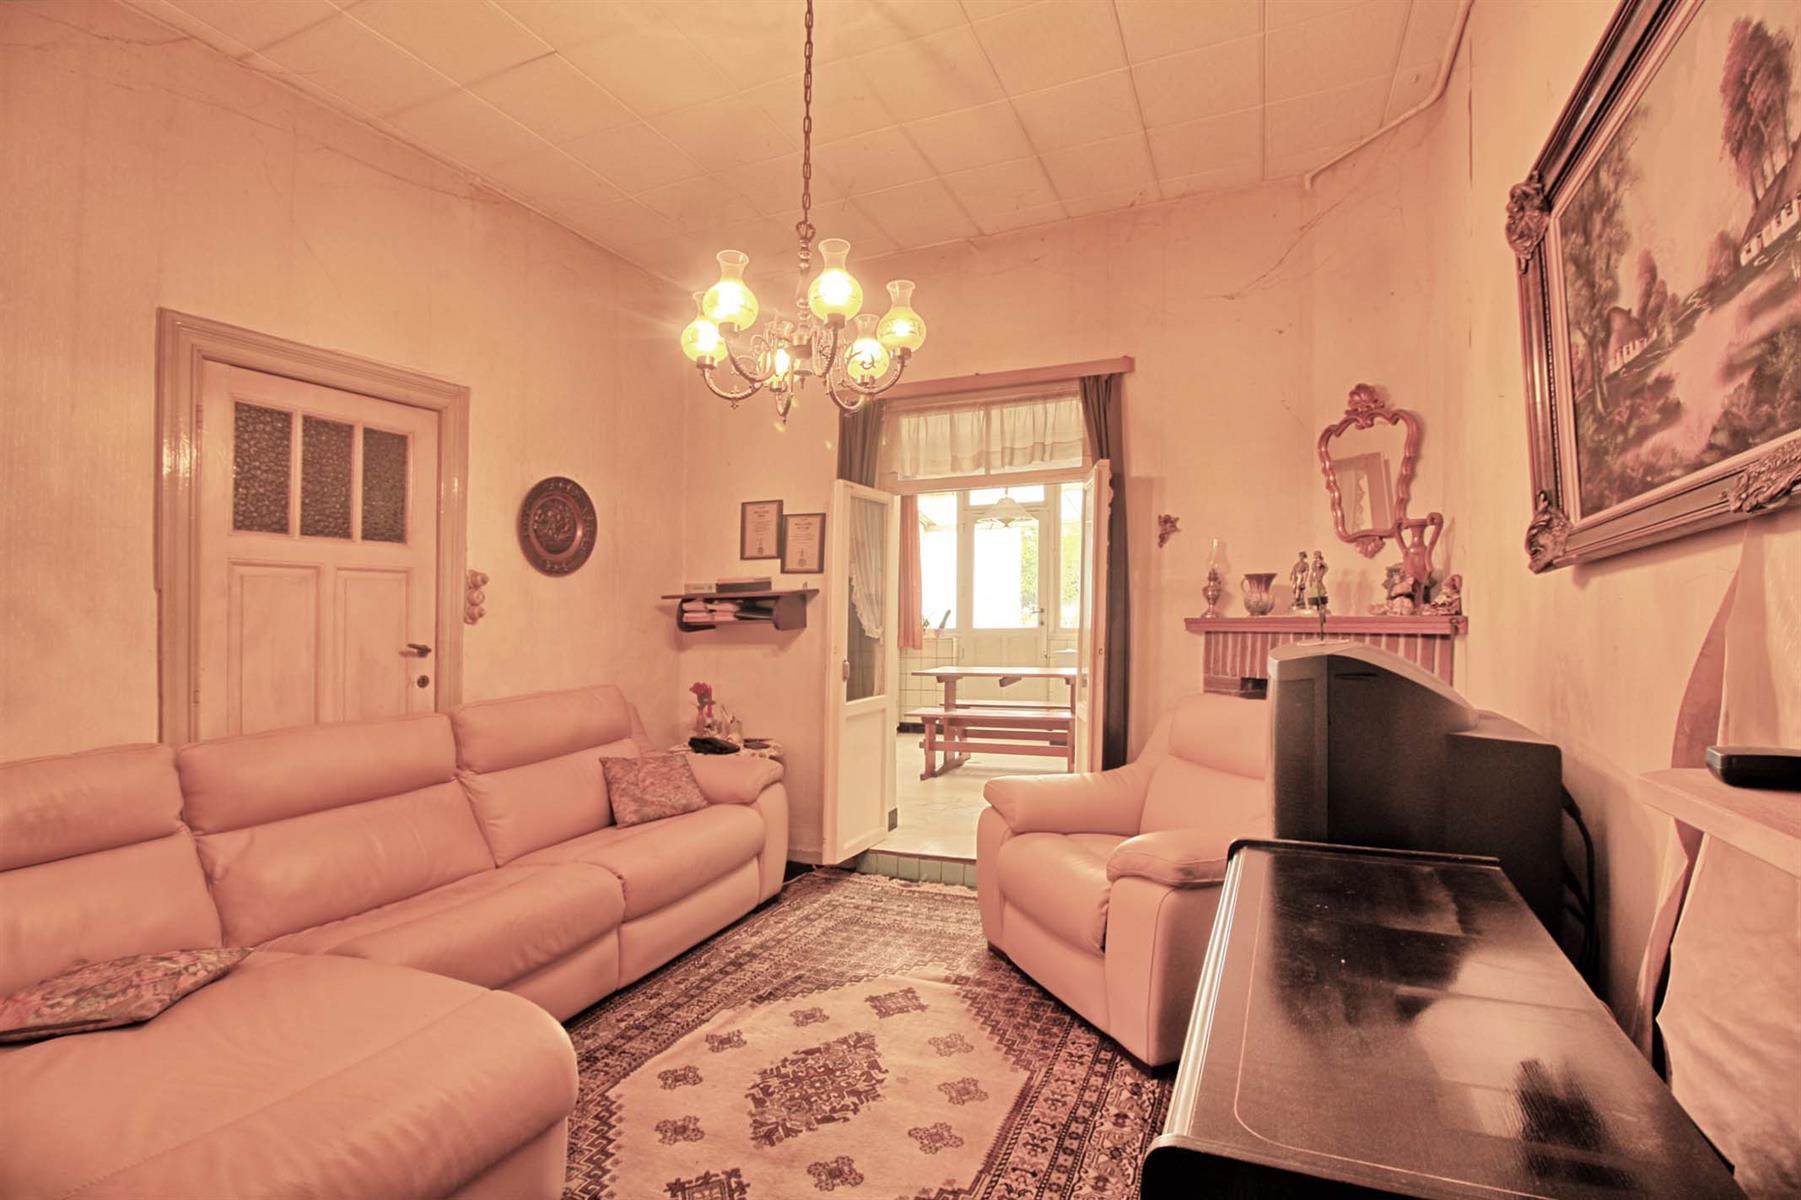 Eengezinswoning - Woluwe-Saint-Lambert - #4106876-3